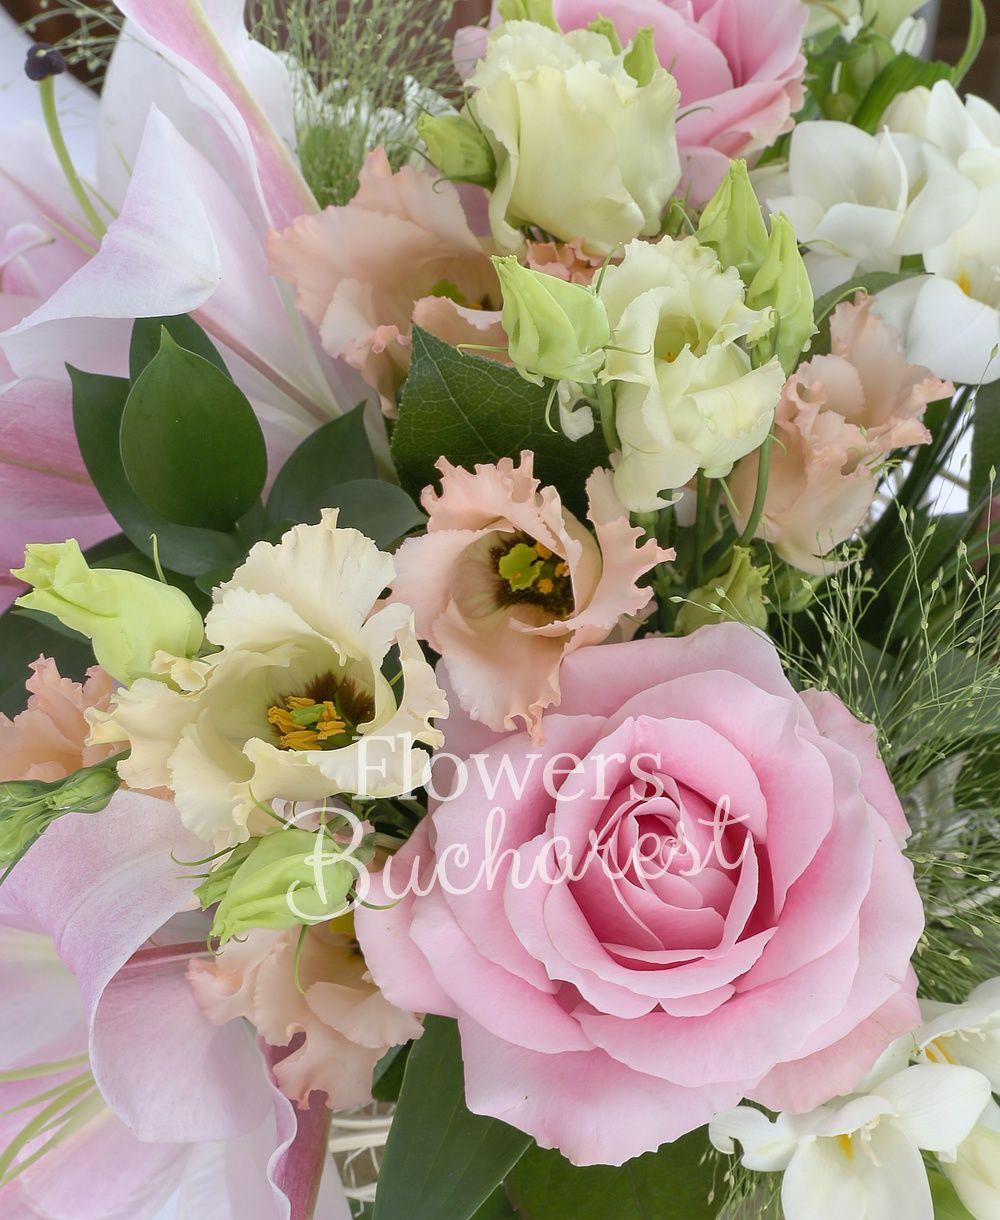 1 pink lily, 3 pink roses, 3 pink lisianthus, 5 white freesias, 2 white alstroemeria, greenery